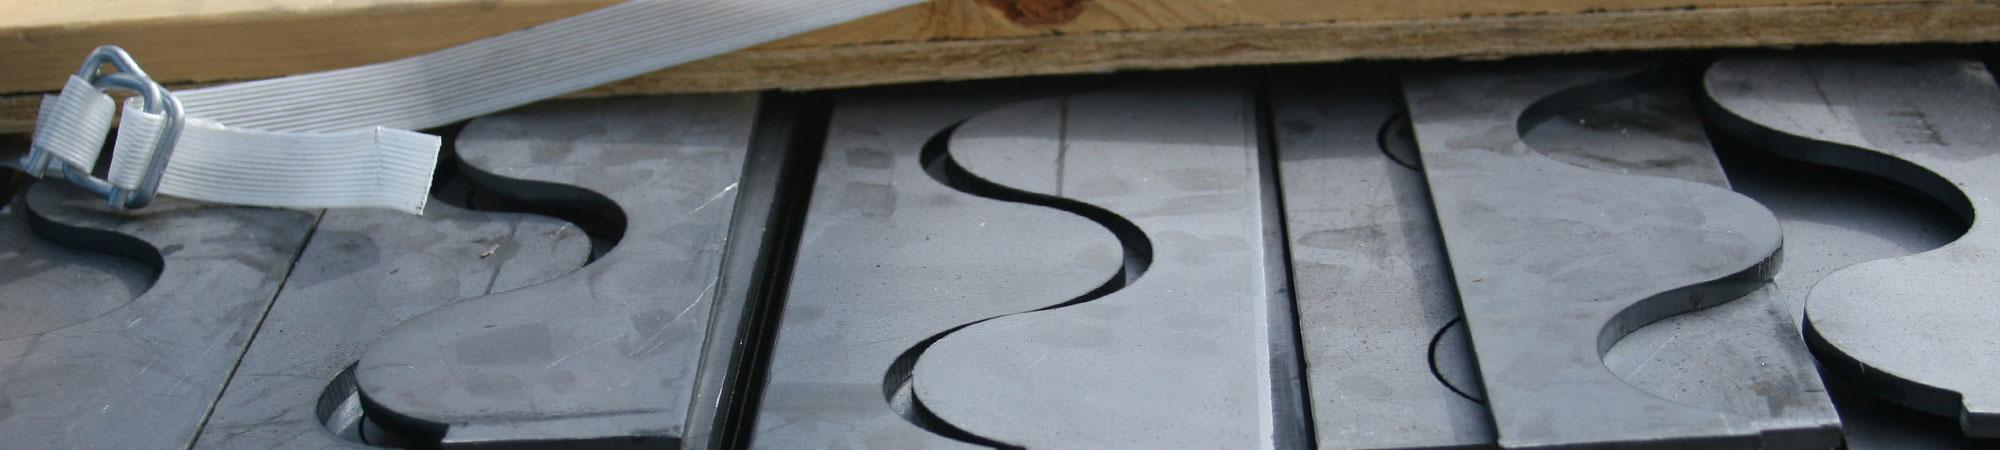 Custom fabrication sample